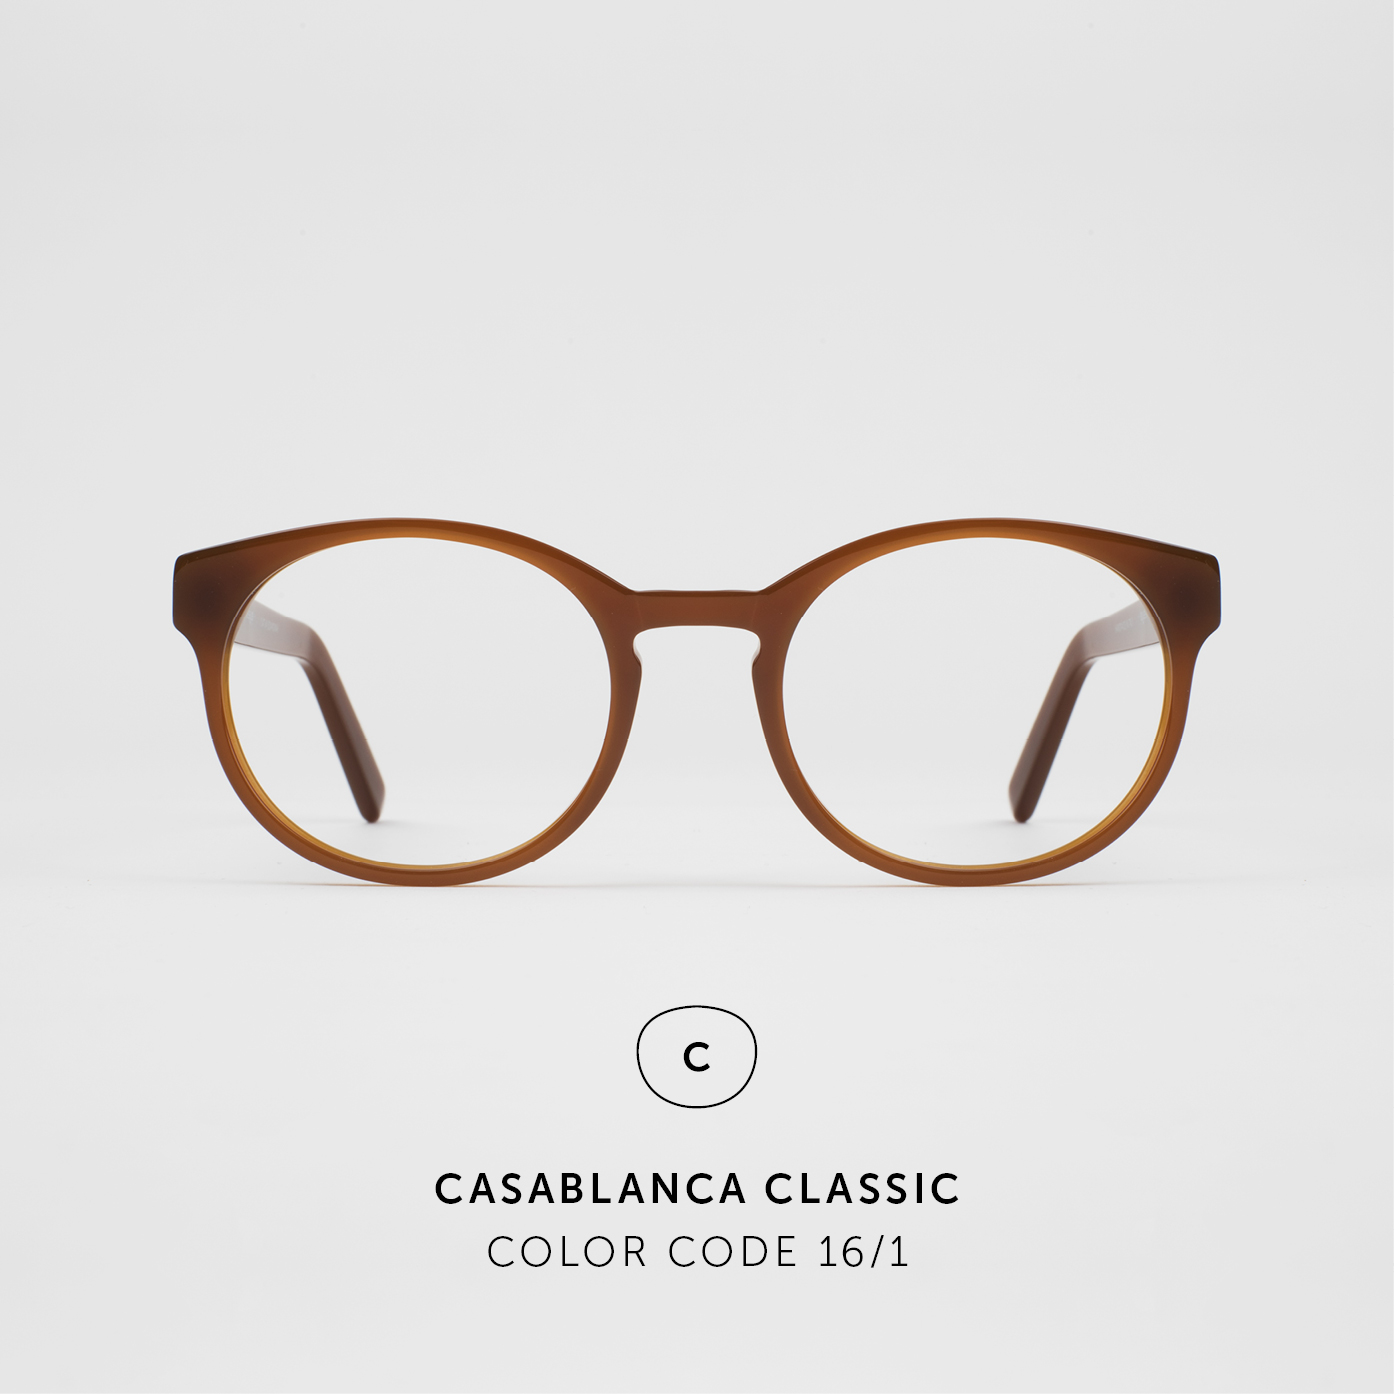 CasablancaClassic41.jpg